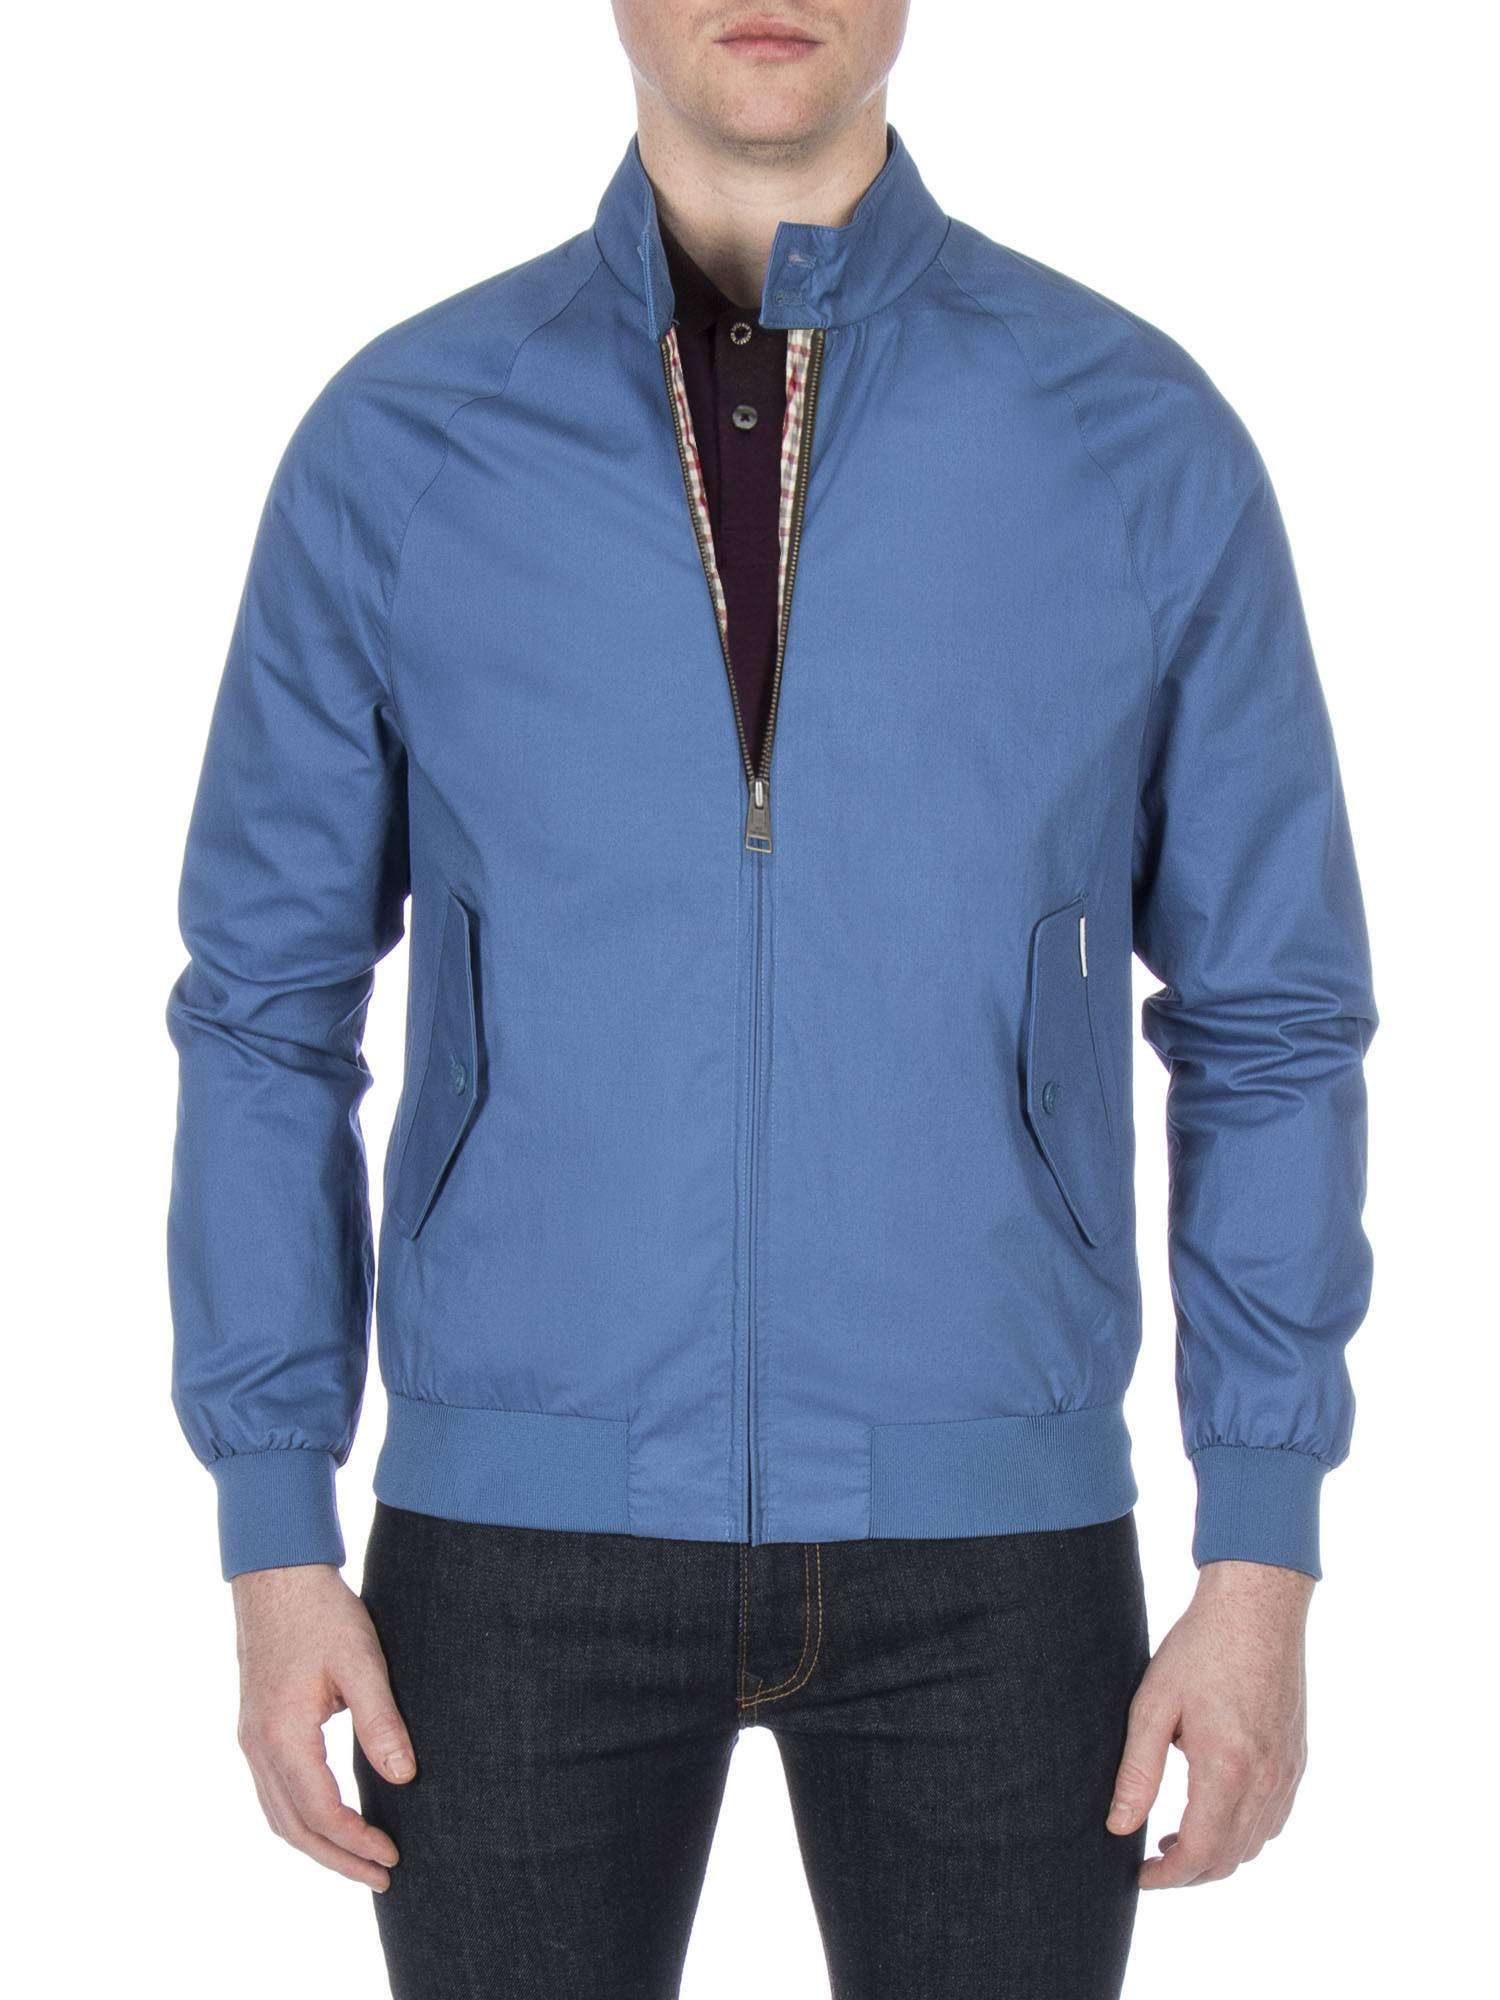 Blue Harrington Jacket Federal blue | Ben Sherman